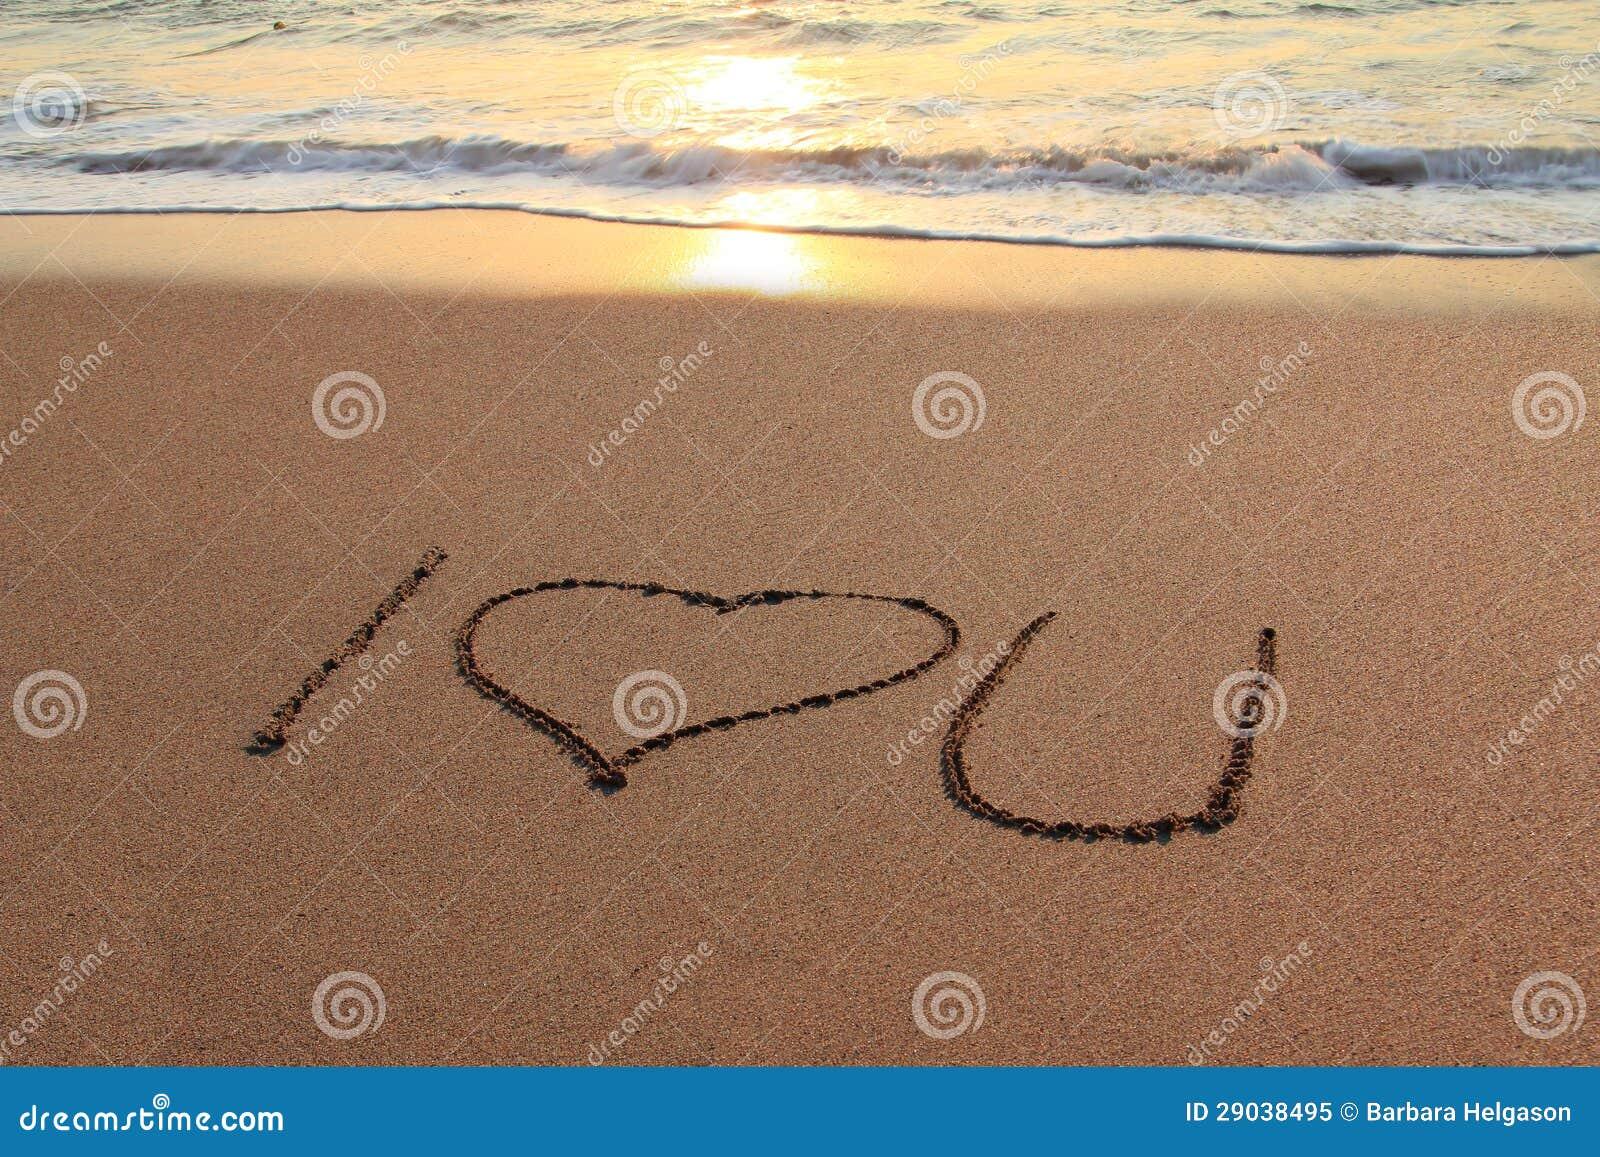 Eu Te Amo Escrito Na Areia Imagens De Stock Royalty Free: Eu Te Amo Praia Imagem De Stock. Imagem De Paradise